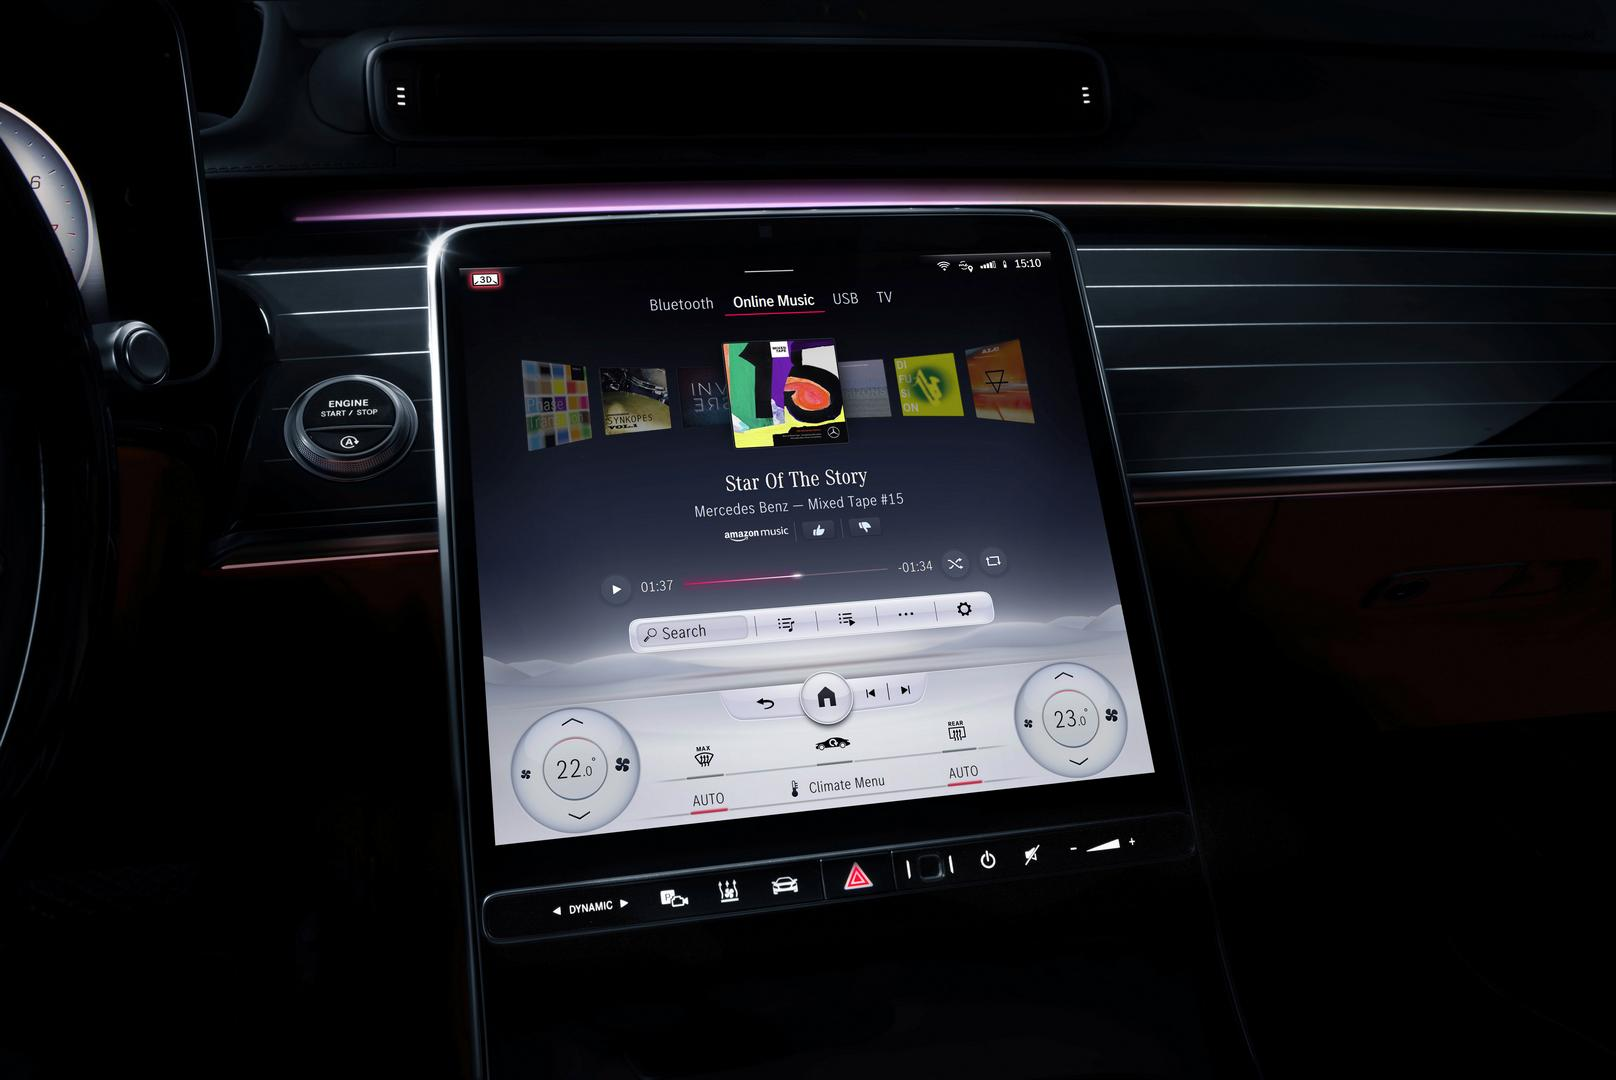 2021 Mercedes-Benz S-Class Driver 3D Display